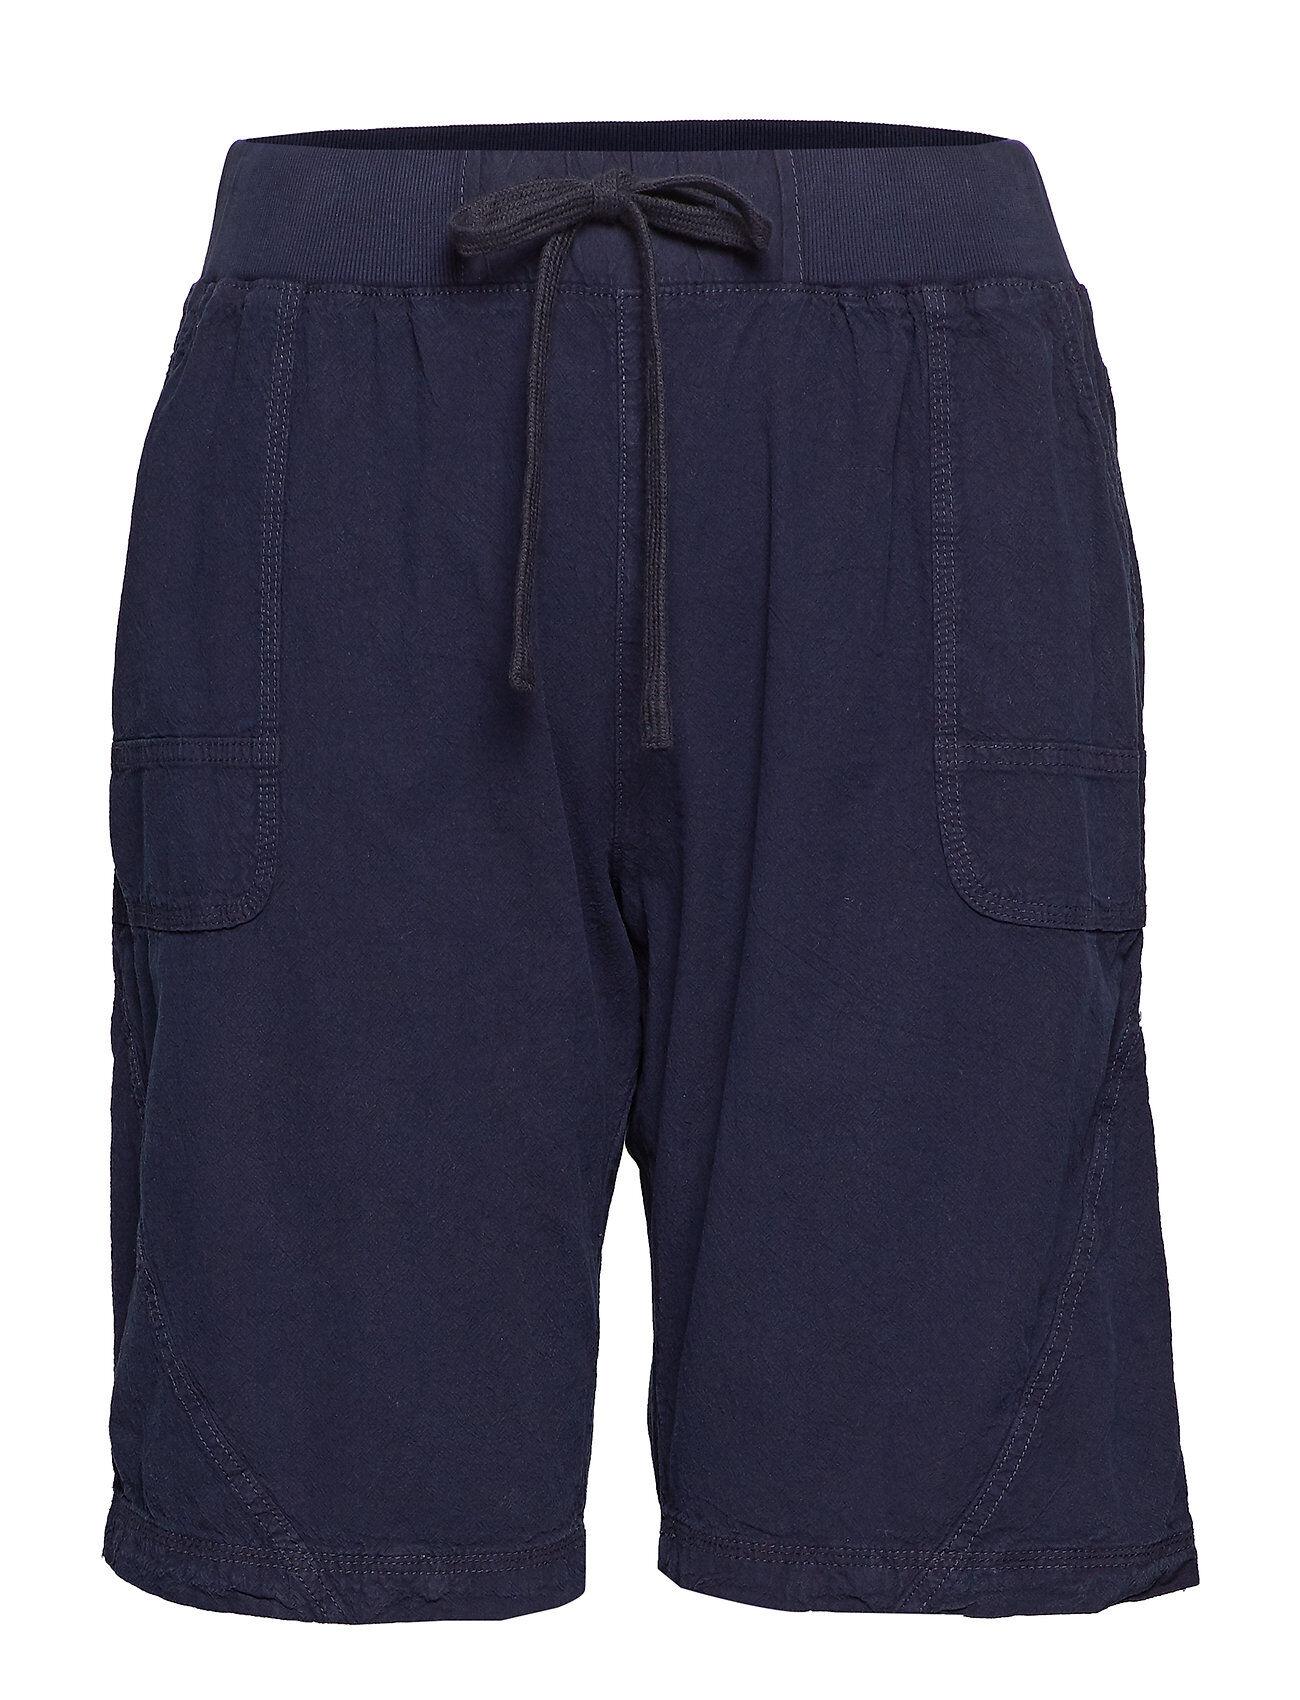 Zizzi Shorts, Above Knee